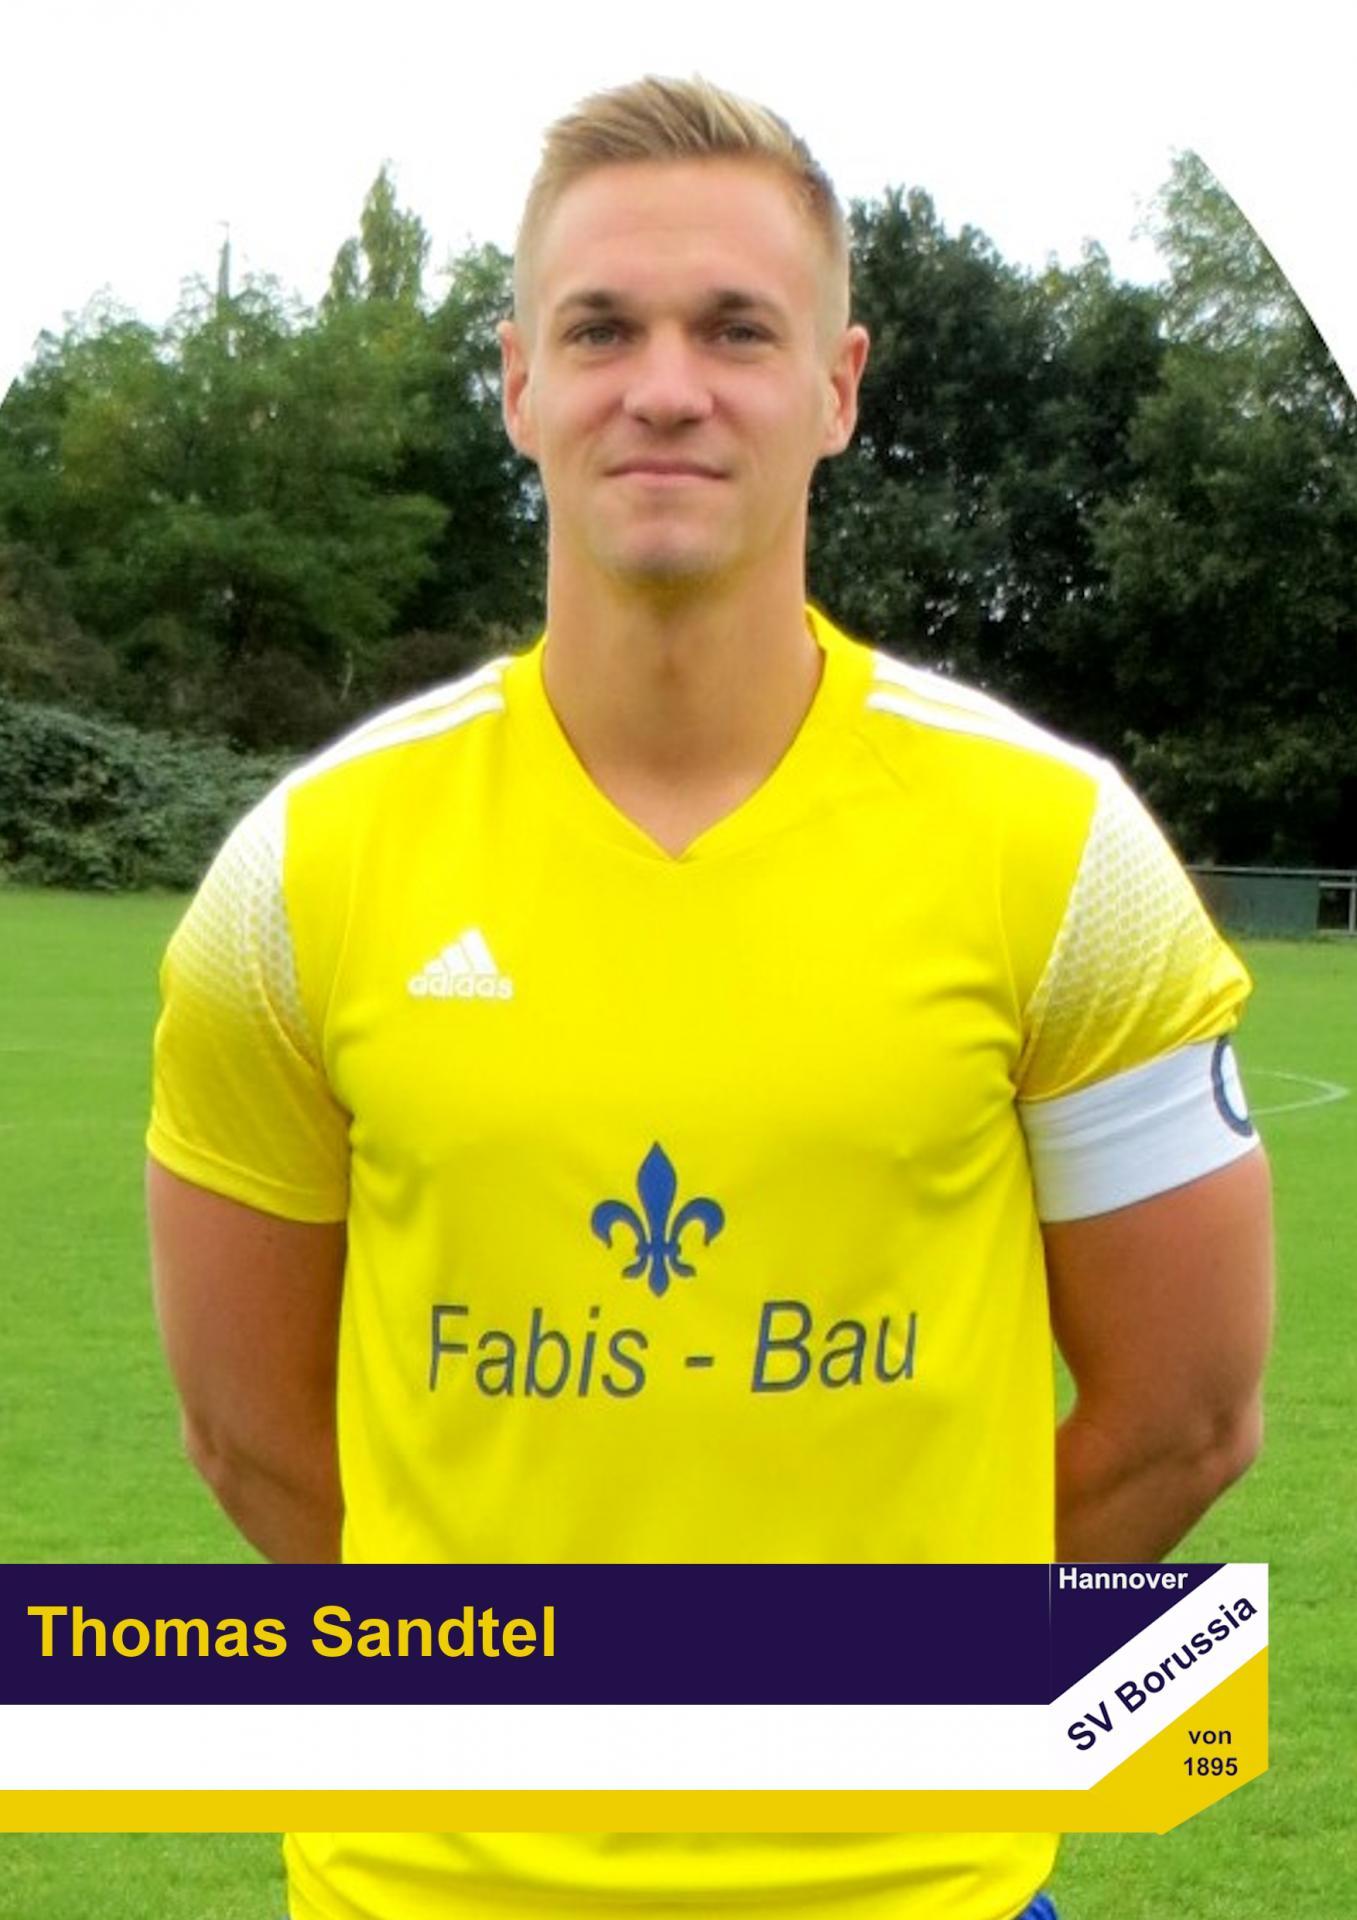 Thomas Sandtel